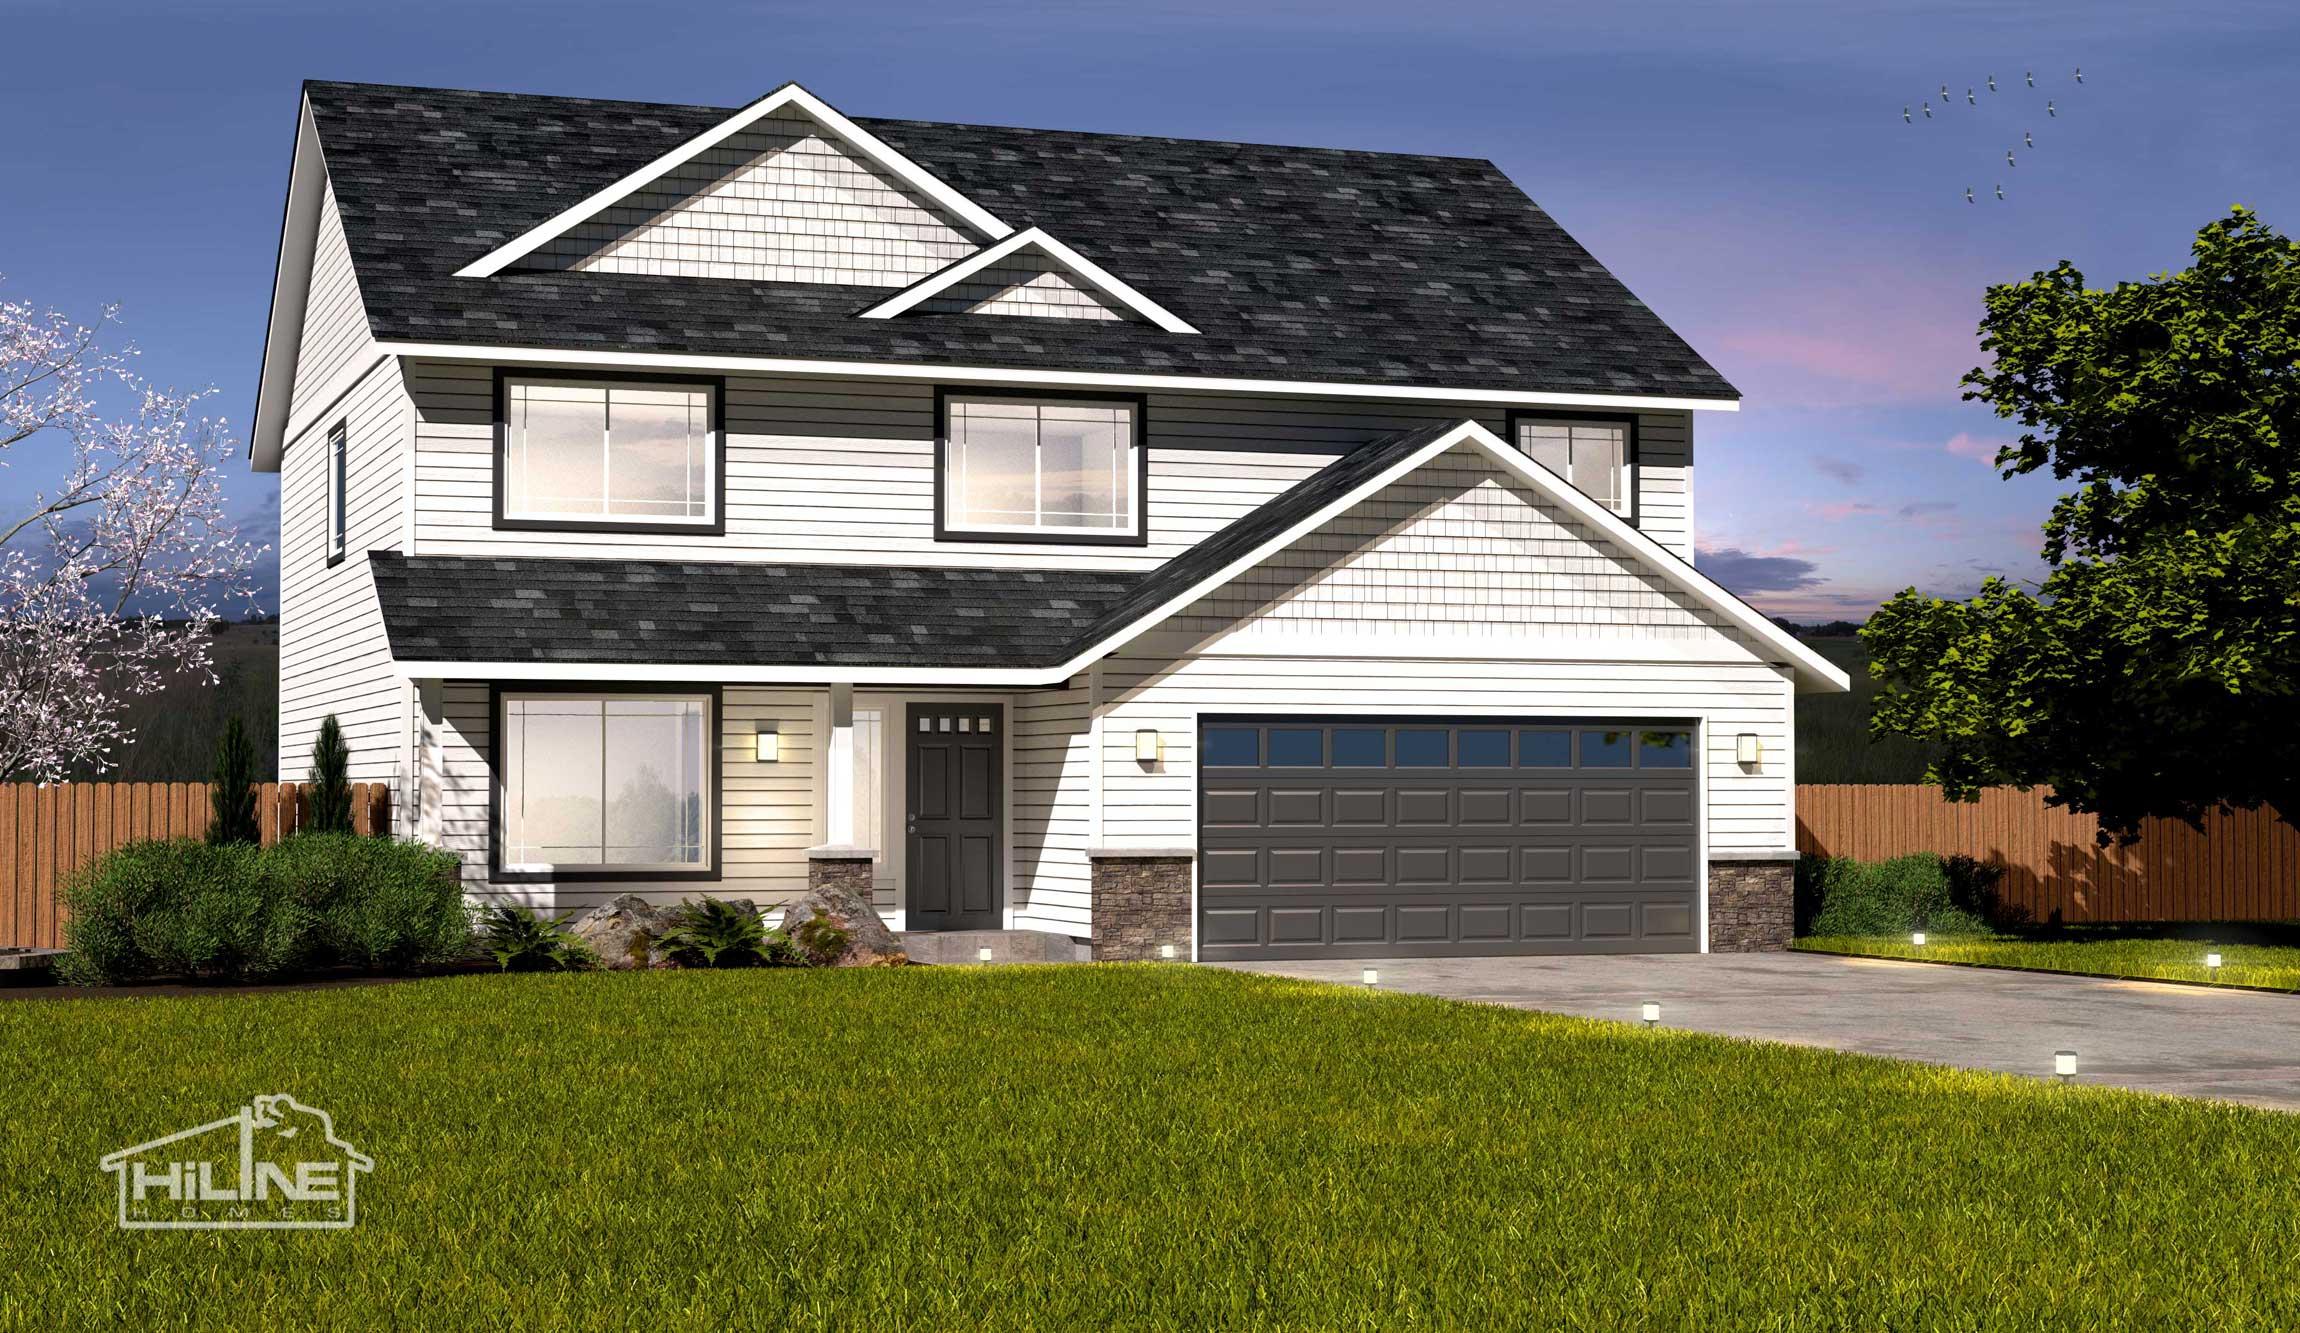 Home Plan 2373